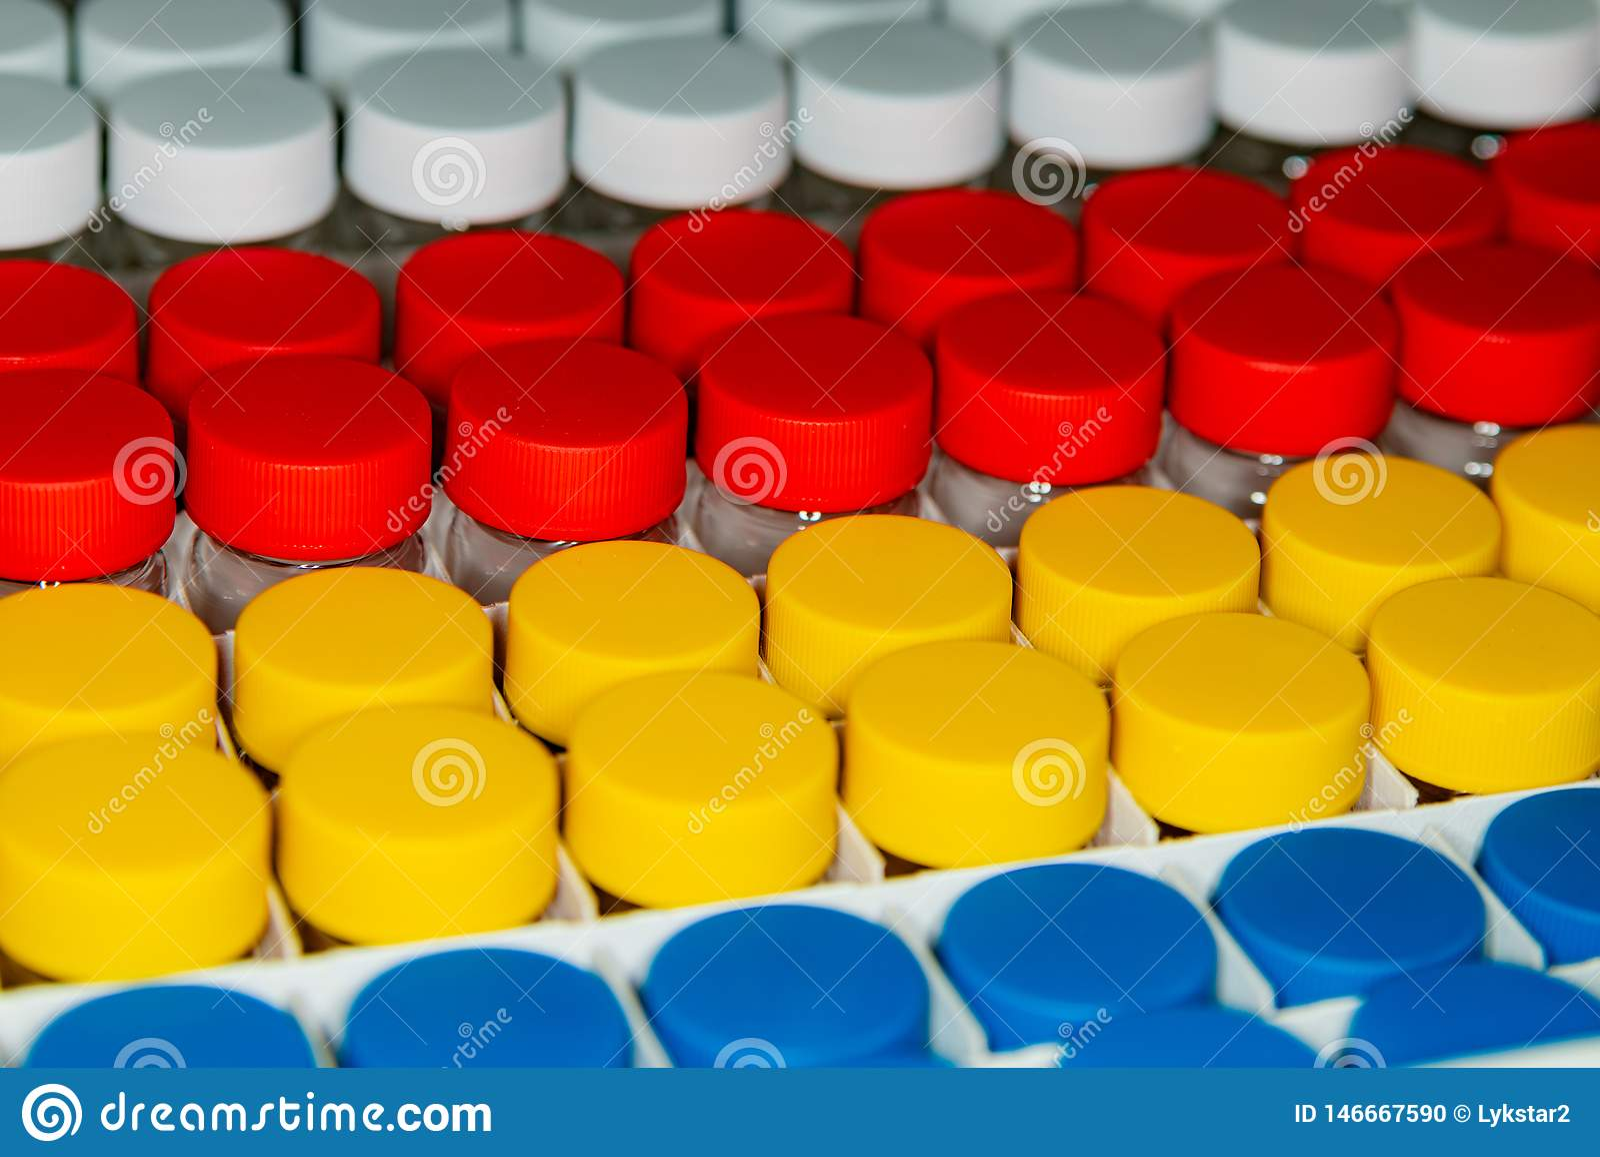 Предпосылка белых, красных, желтых и голубых консервных банок